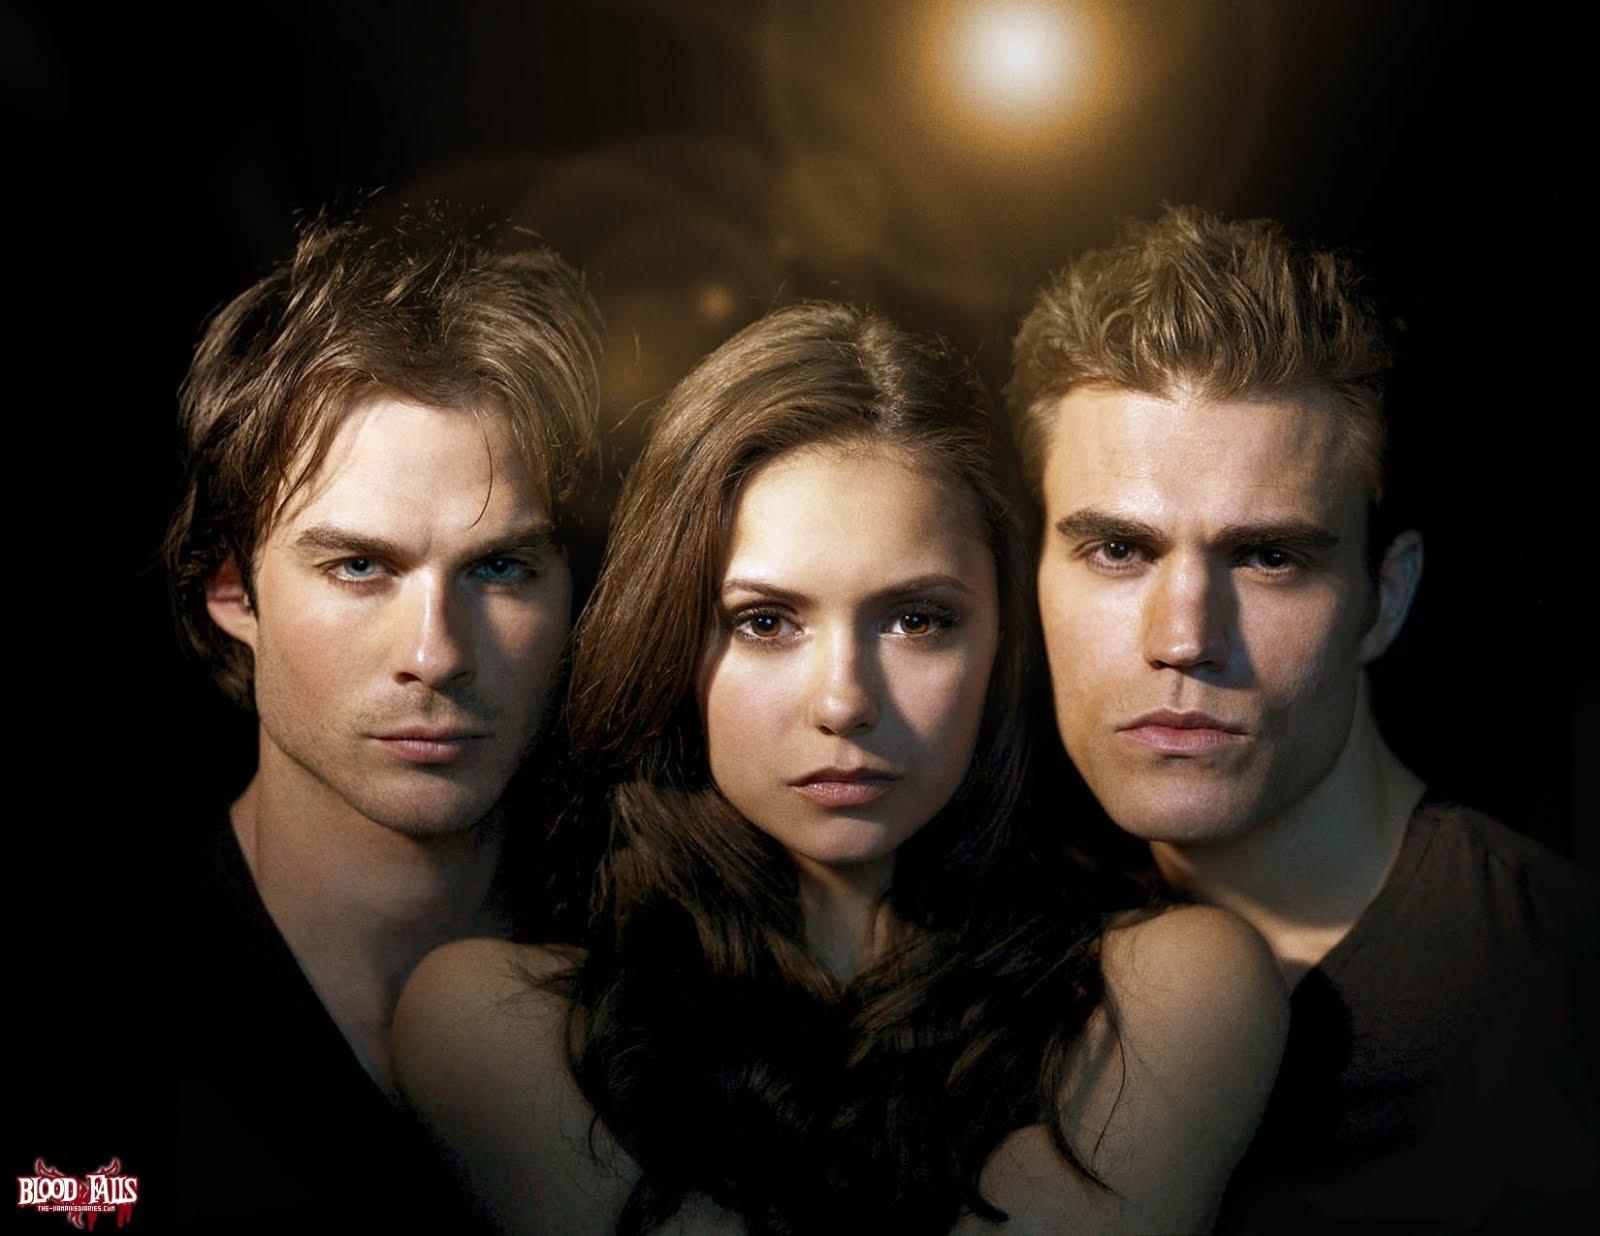 http://4.bp.blogspot.com/-umcVEmt0WWk/TiwrtPOhFqI/AAAAAAAAmhQ/9dqLKsHsef4/s1600/the-vampire-diaries-season-3.jpg